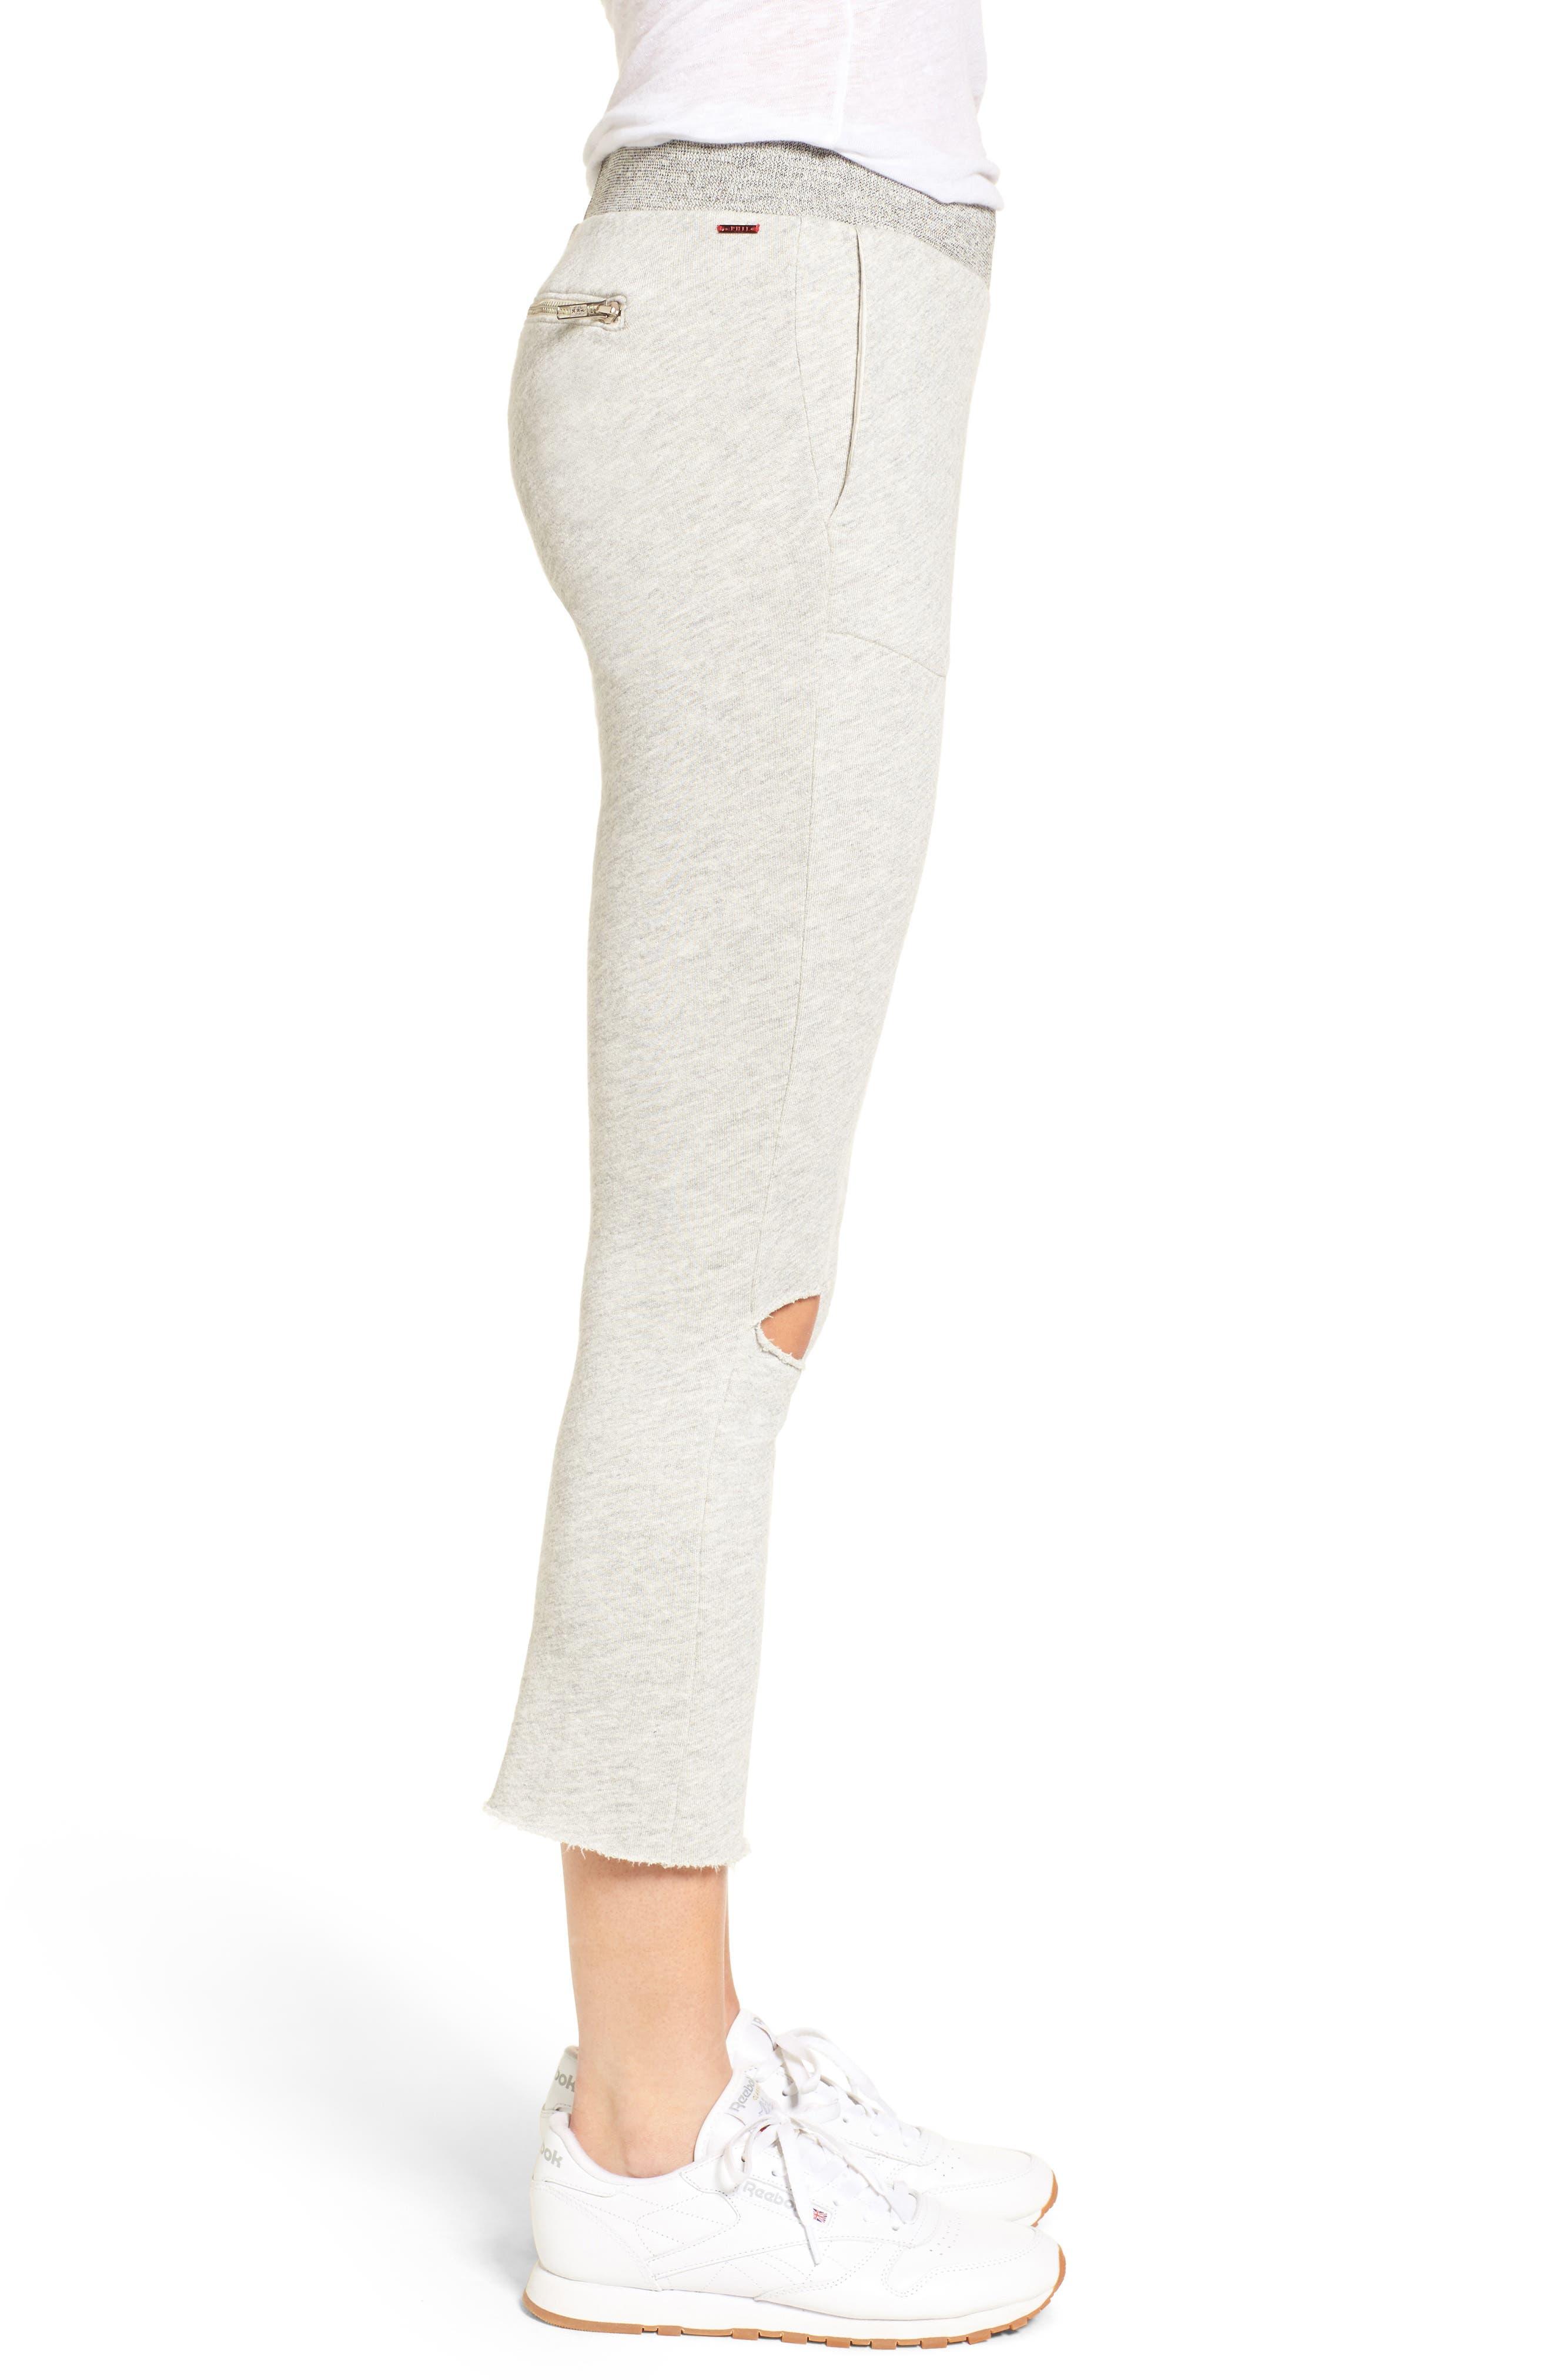 Malibu Slit Knee Sweatpants,                             Alternate thumbnail 3, color,                             Heather Grey